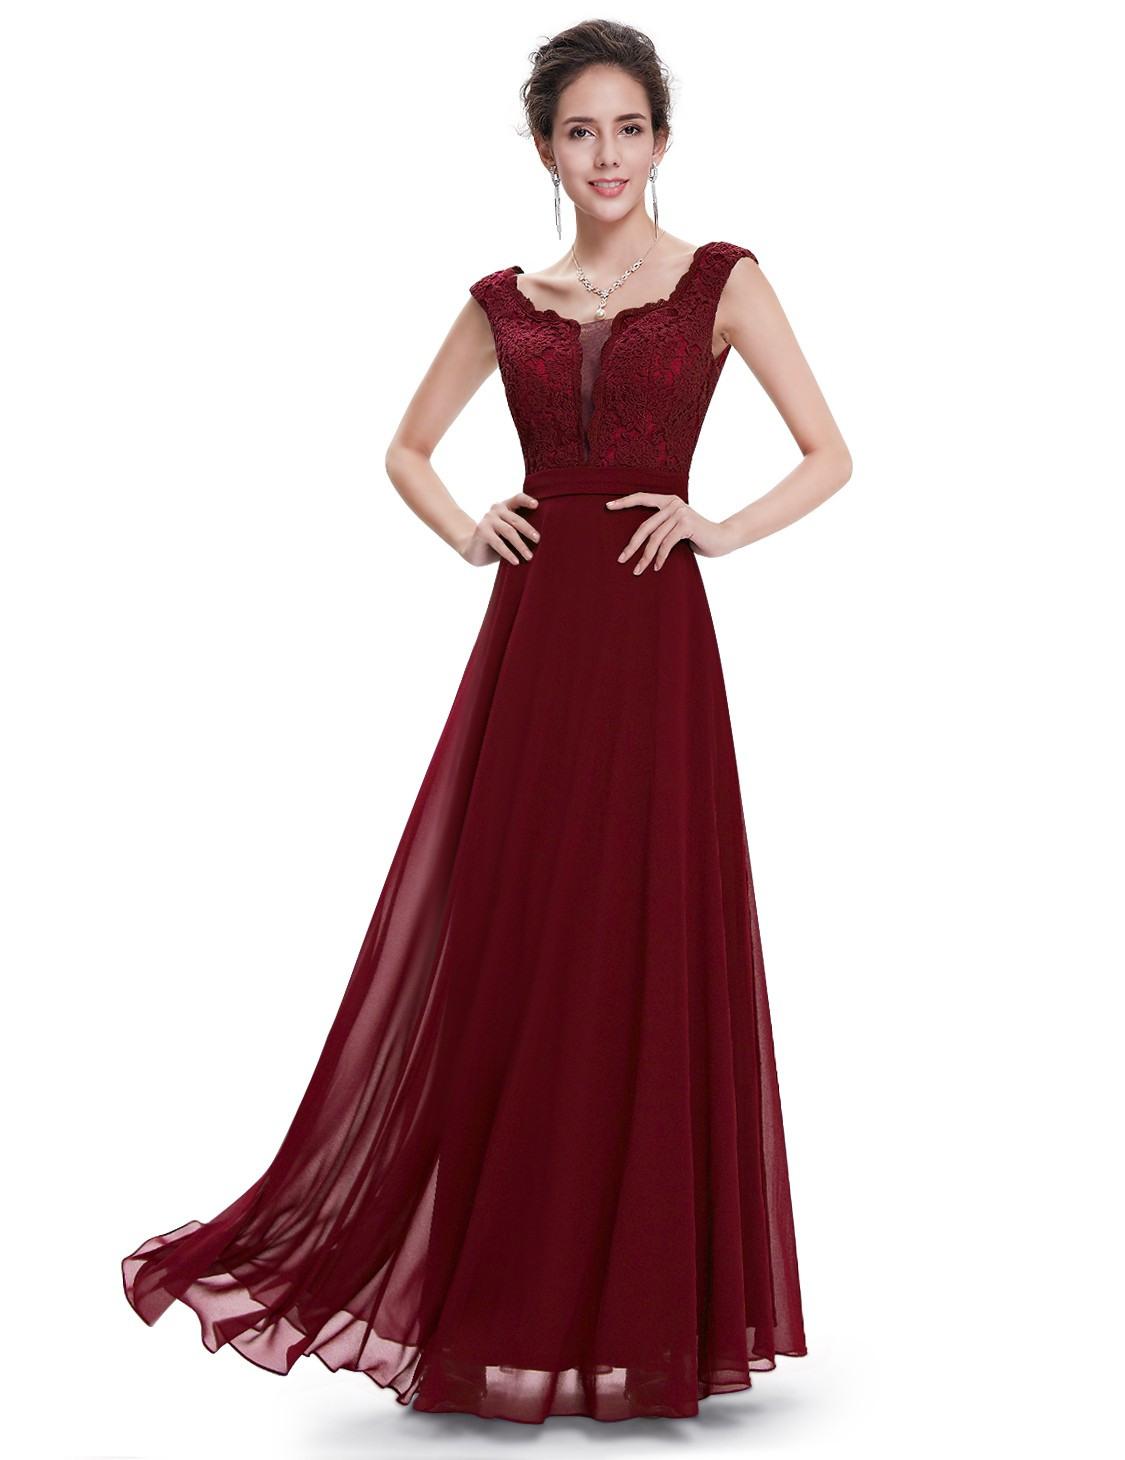 Formal Spektakulär Weinrotes Abendkleid VertriebFormal Perfekt Weinrotes Abendkleid Design